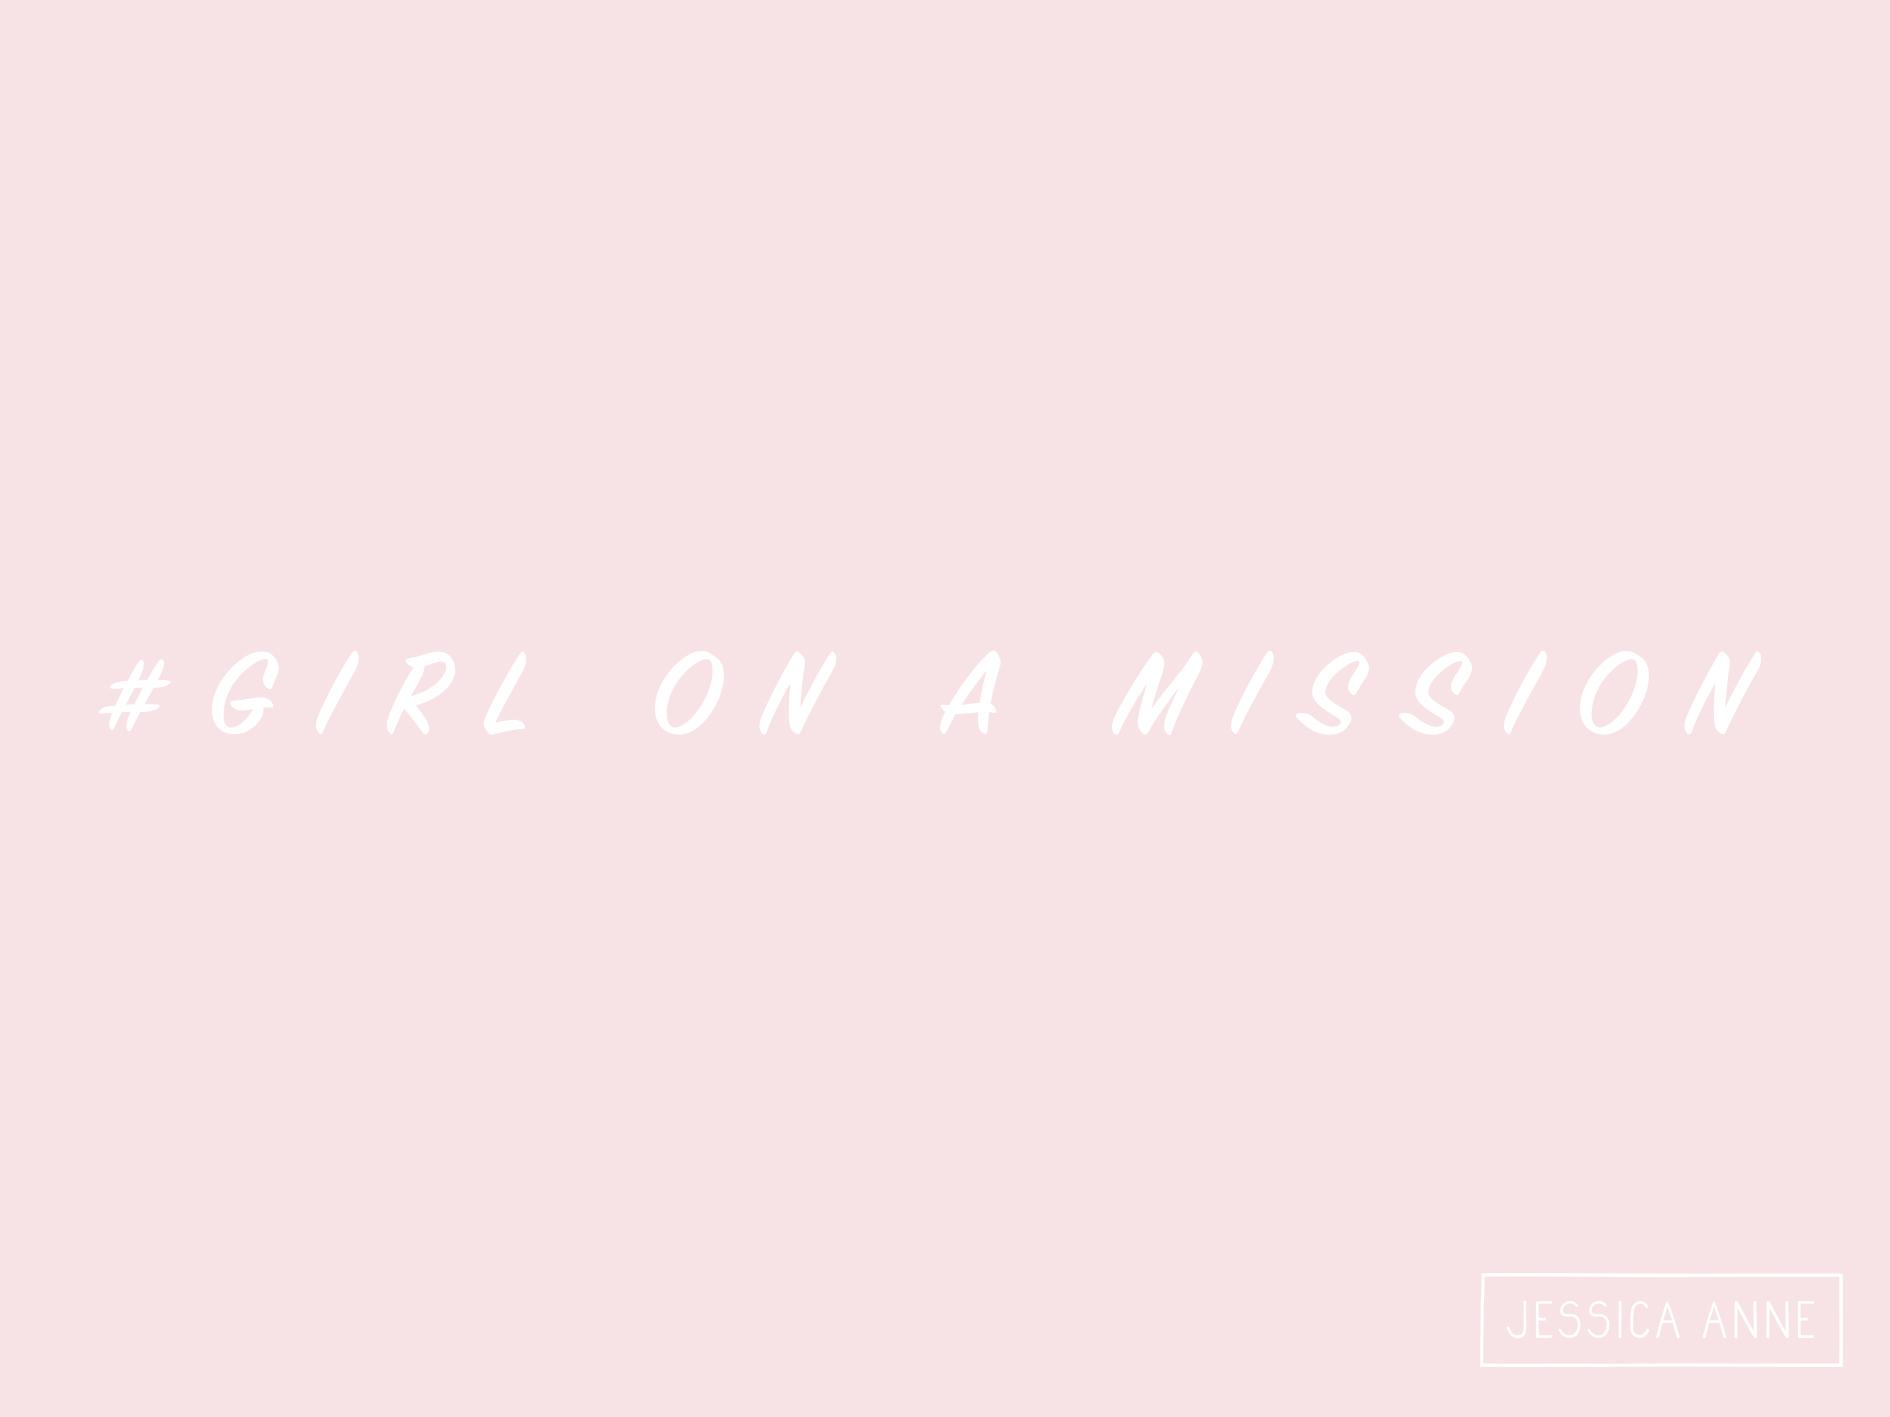 #girlonamission.jpg